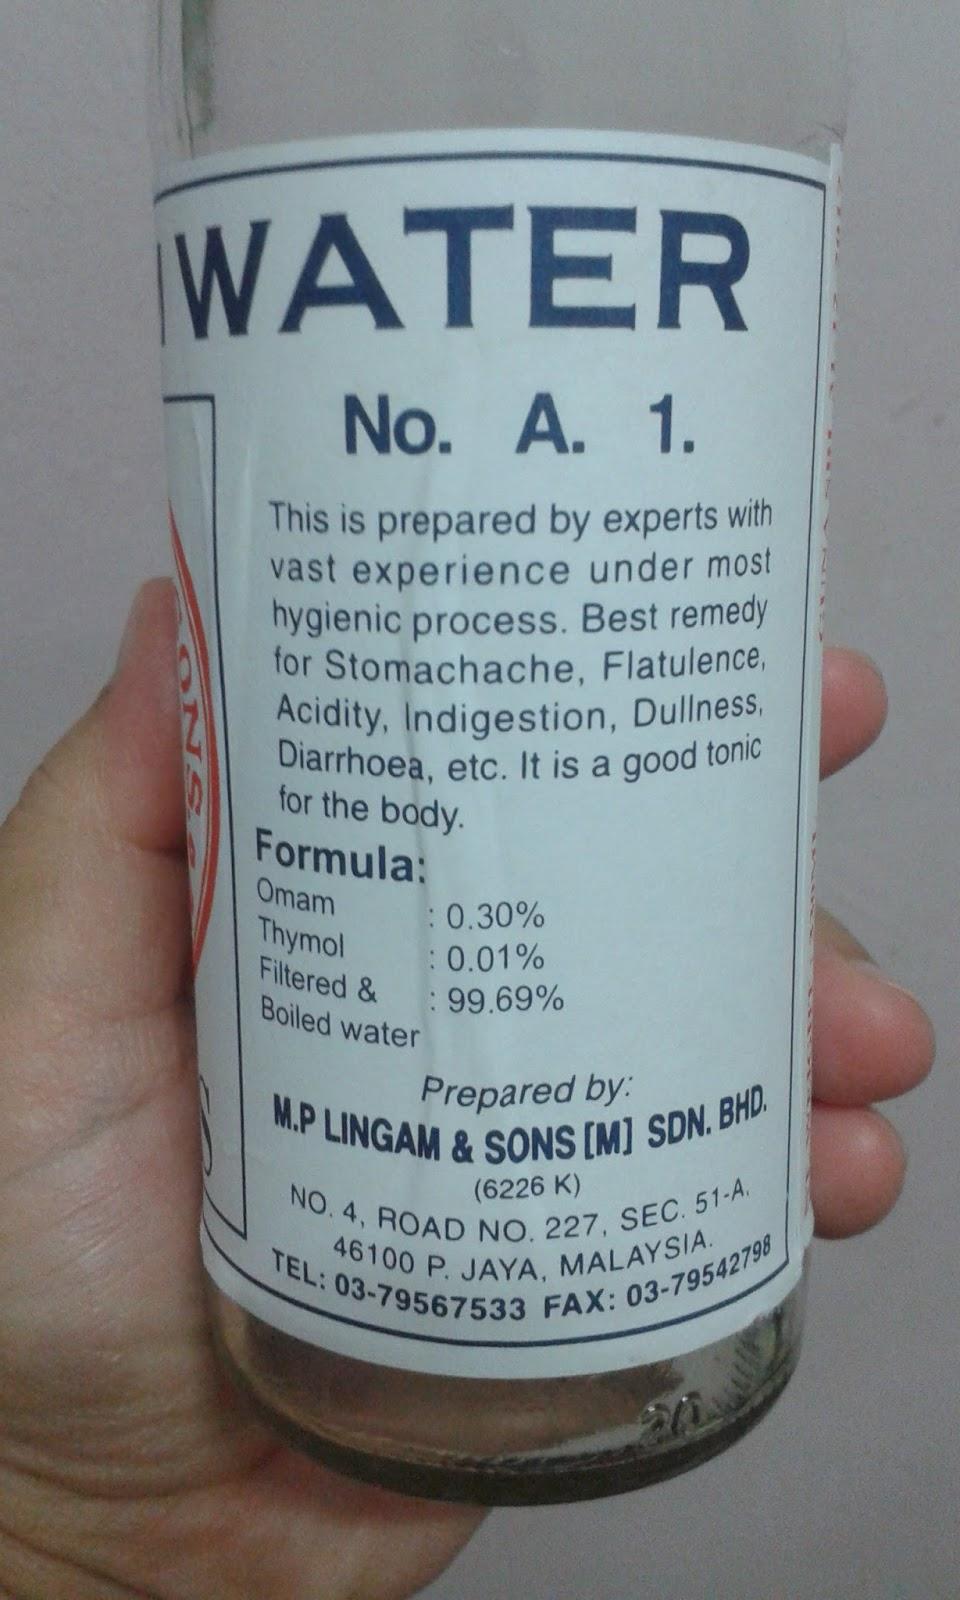 Air lemuju, khasiat air lemuju, sakit badan, minum air lemuju